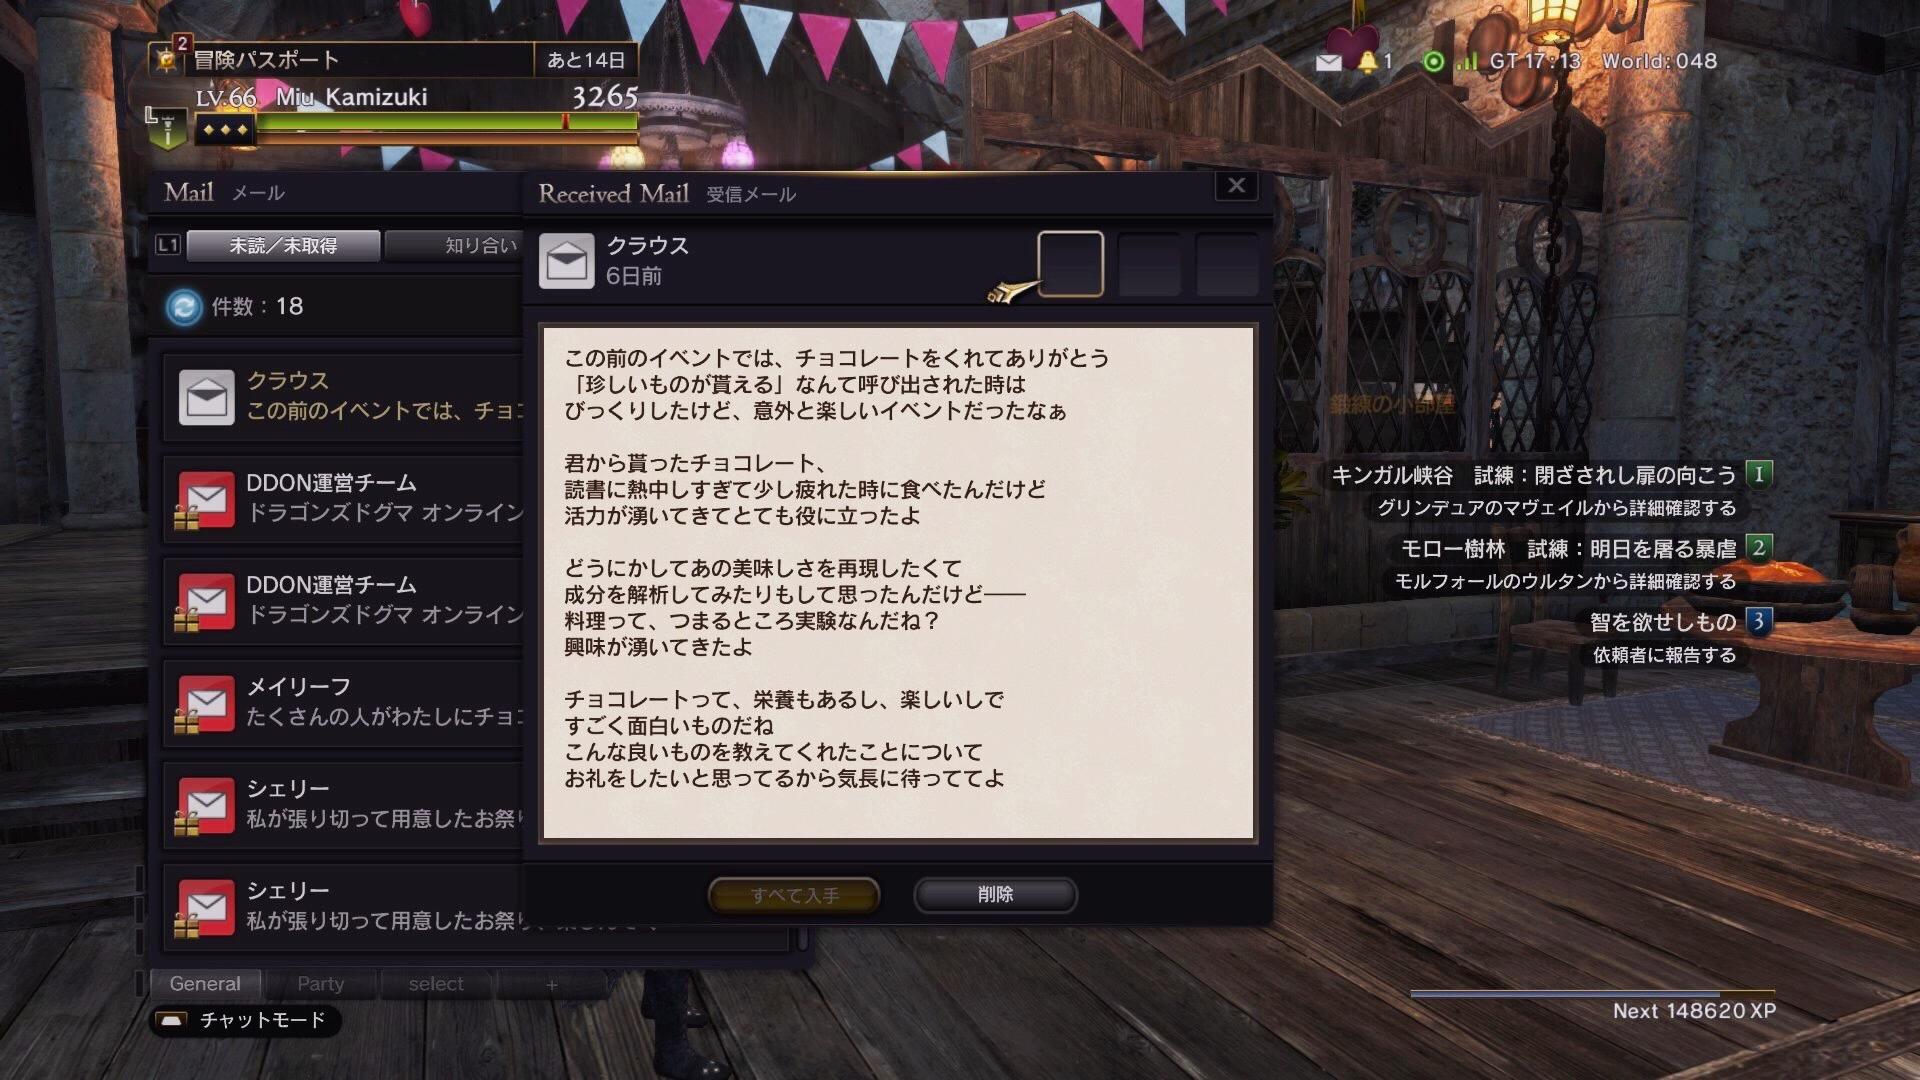 http://pds.exblog.jp/pds/1/201703/10/66/e0366866_13132105.jpg